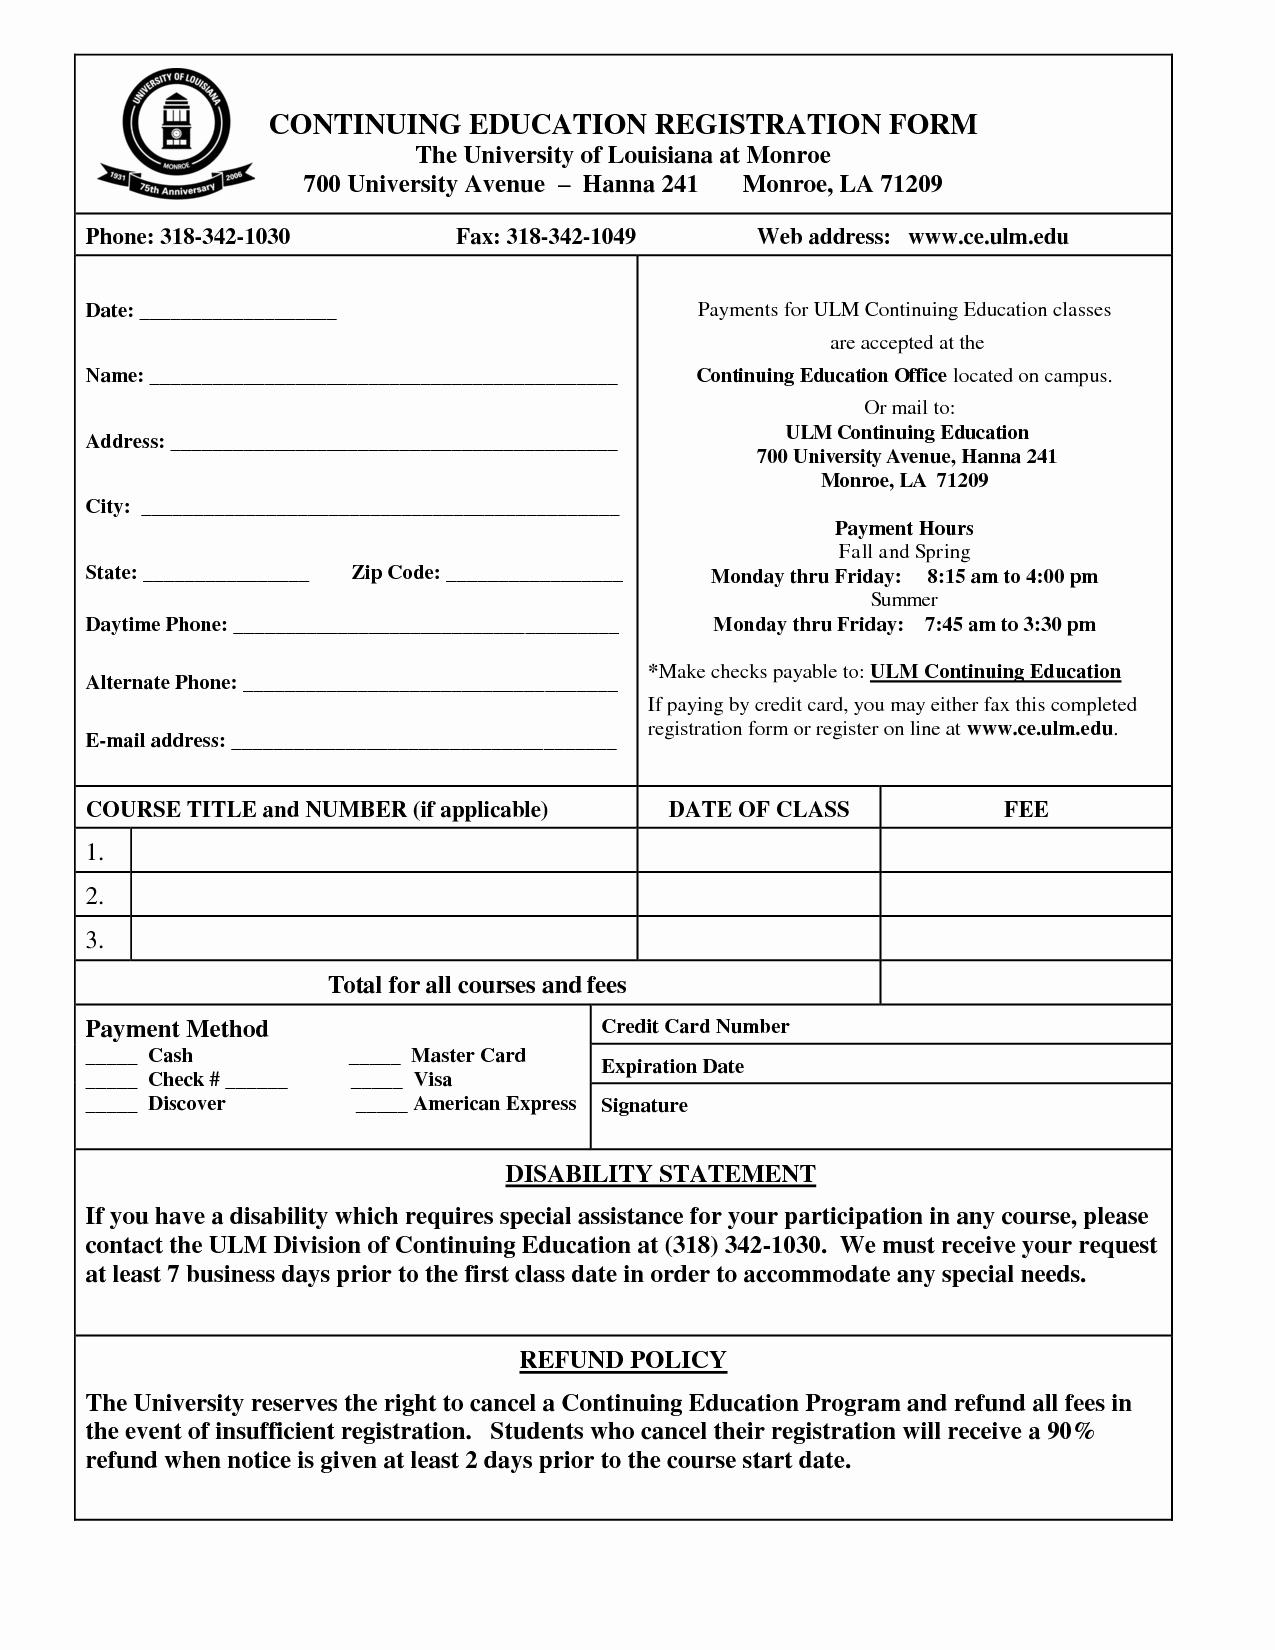 Registration form Template Word Unique Student Application form Template Portablegasgrillweber